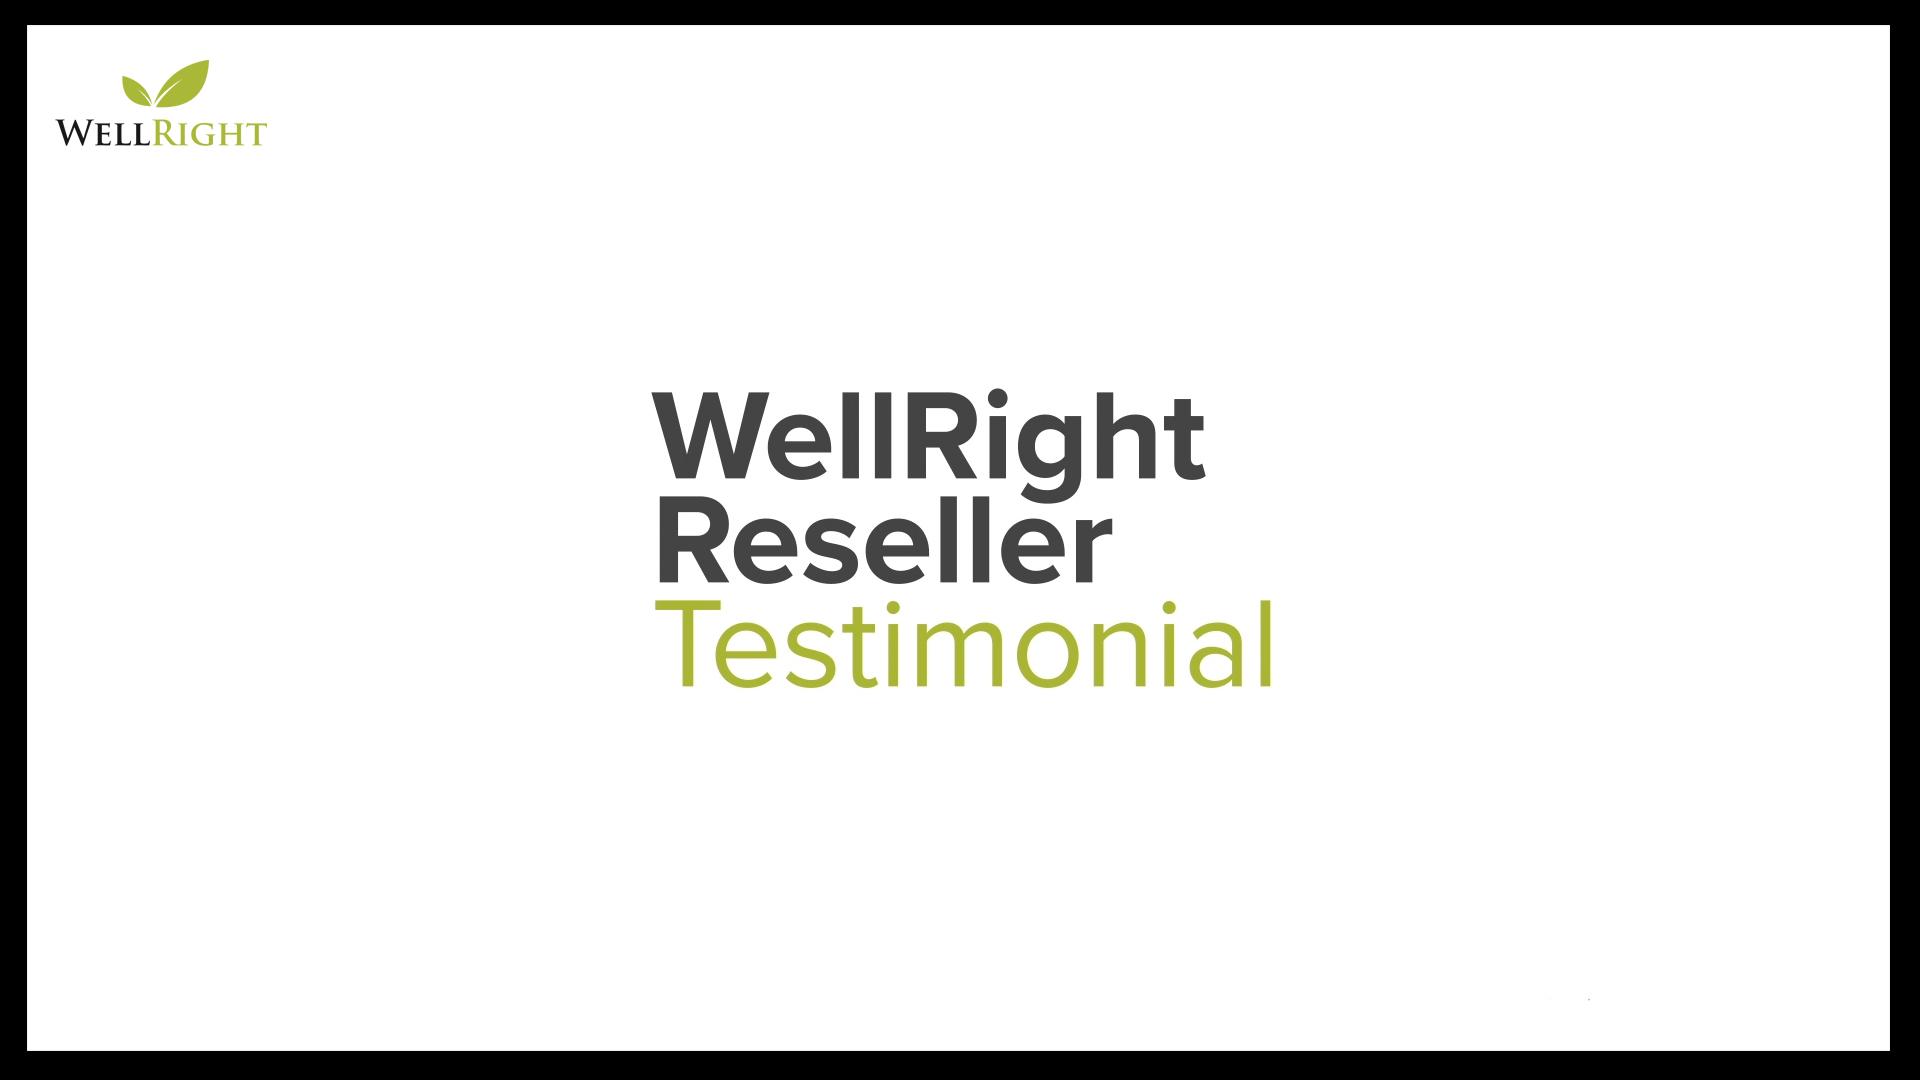 WellRight Reseller Testimonial